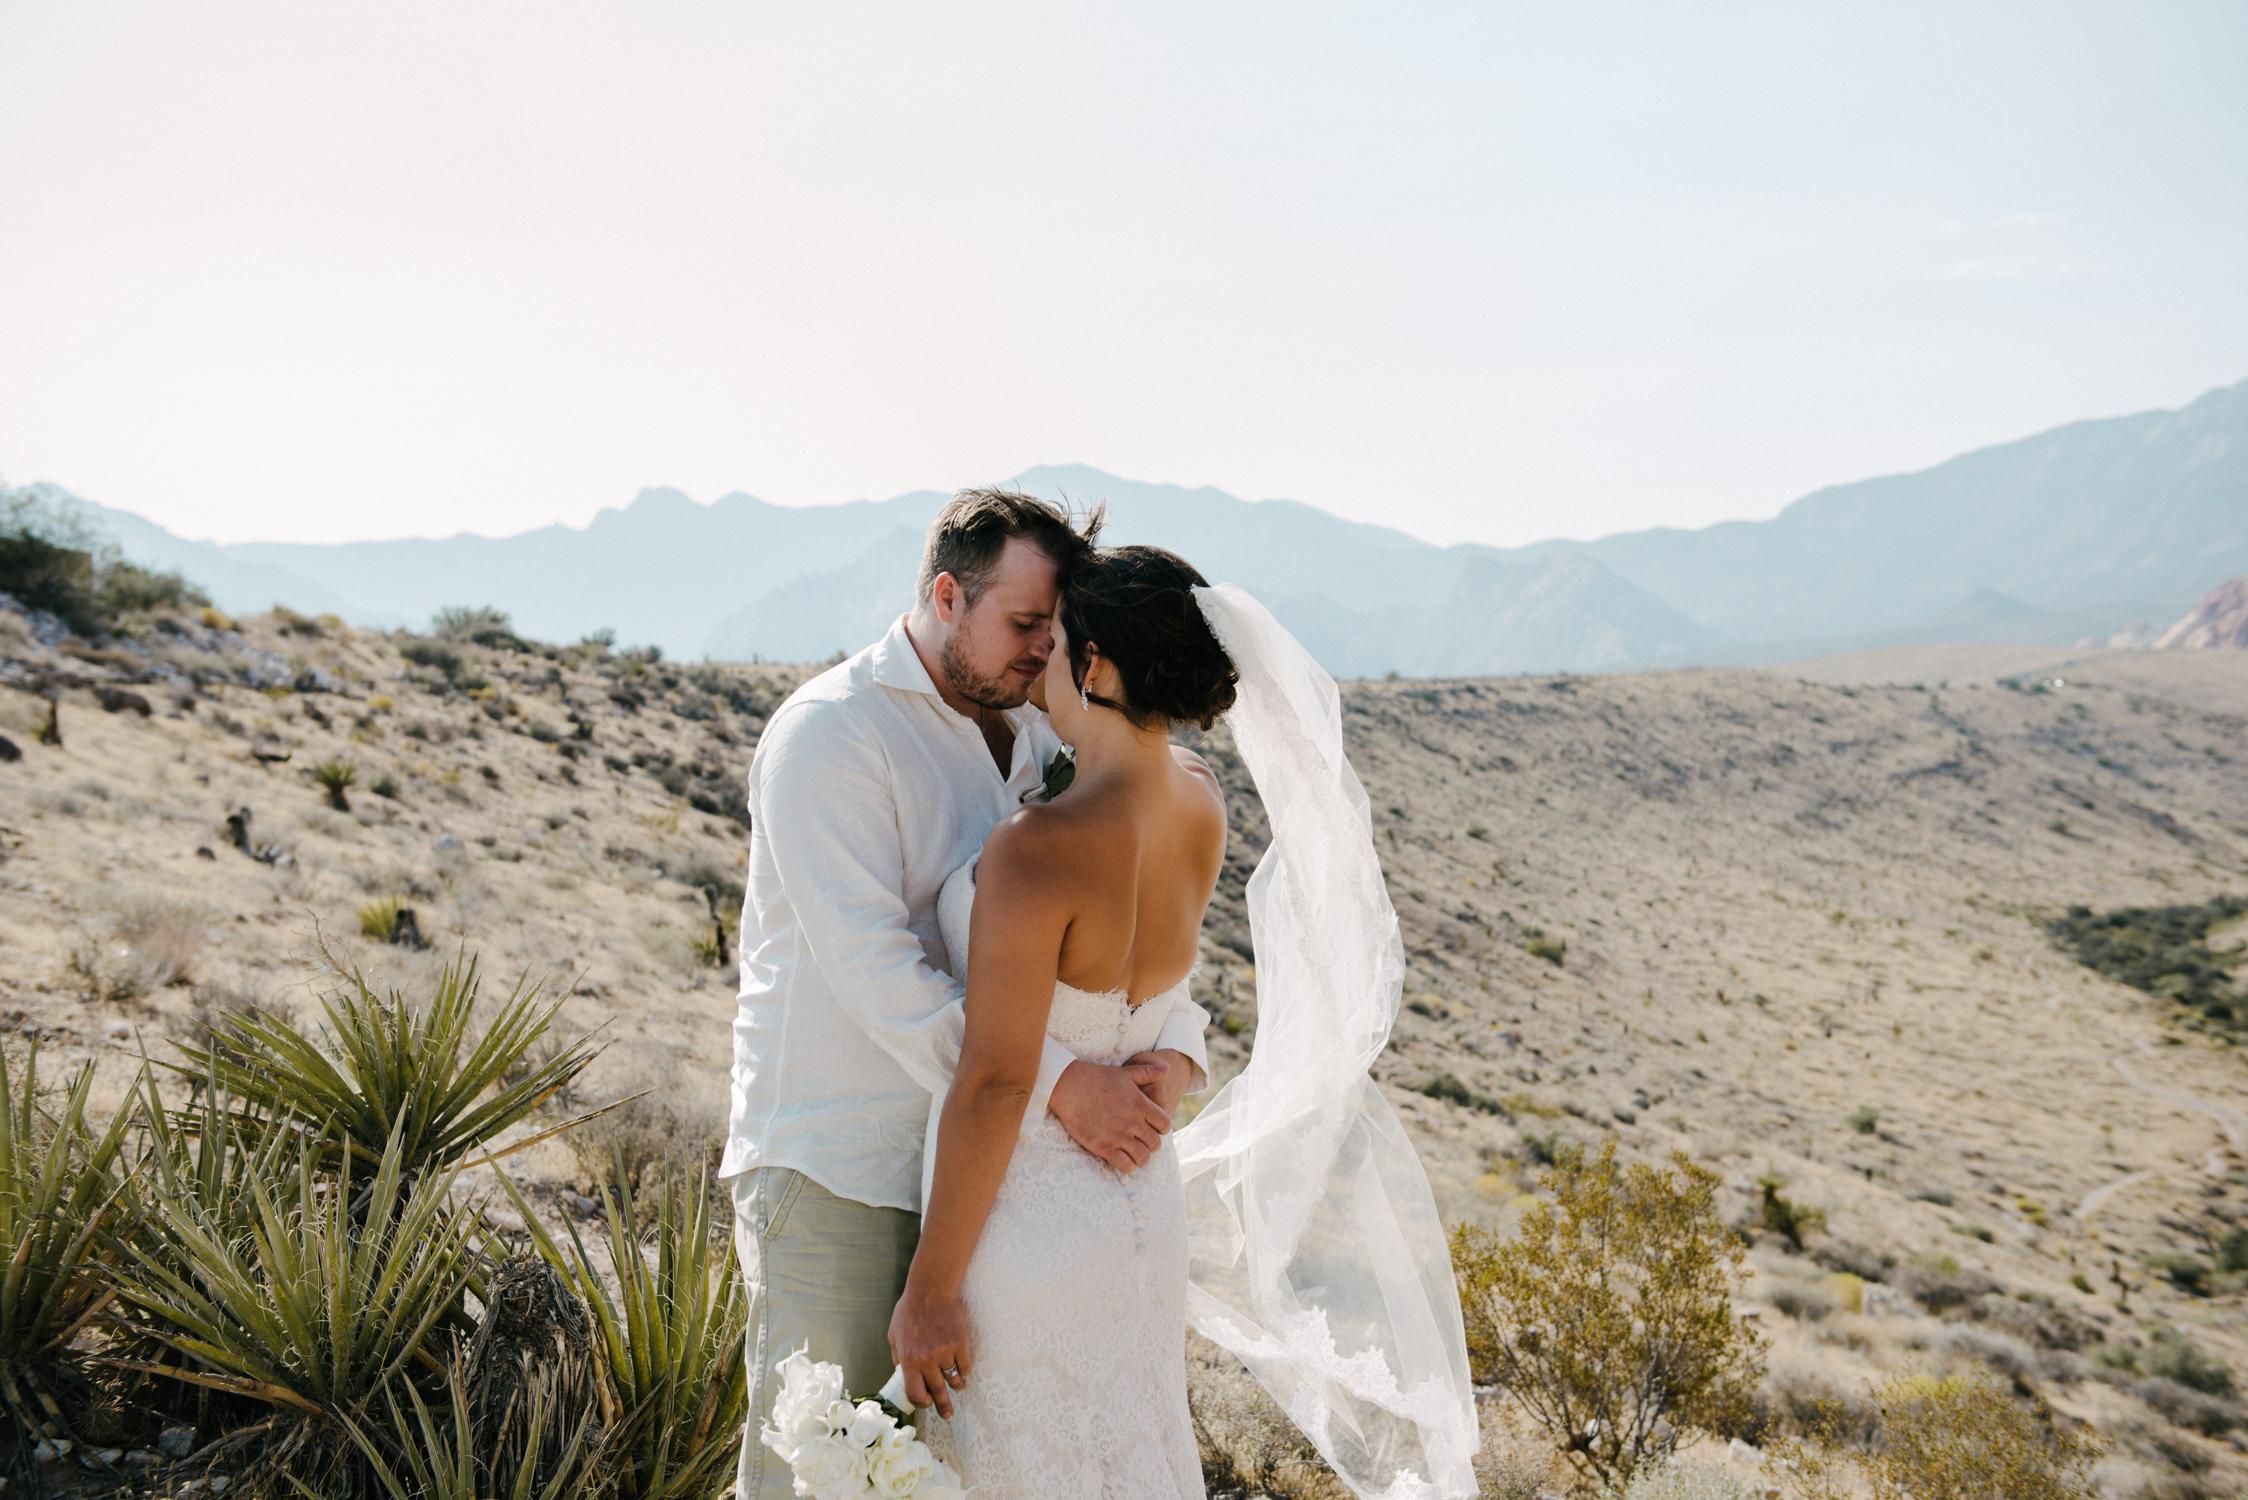 026_Redrock_canyon_vegas_wedding_photographer.jpg